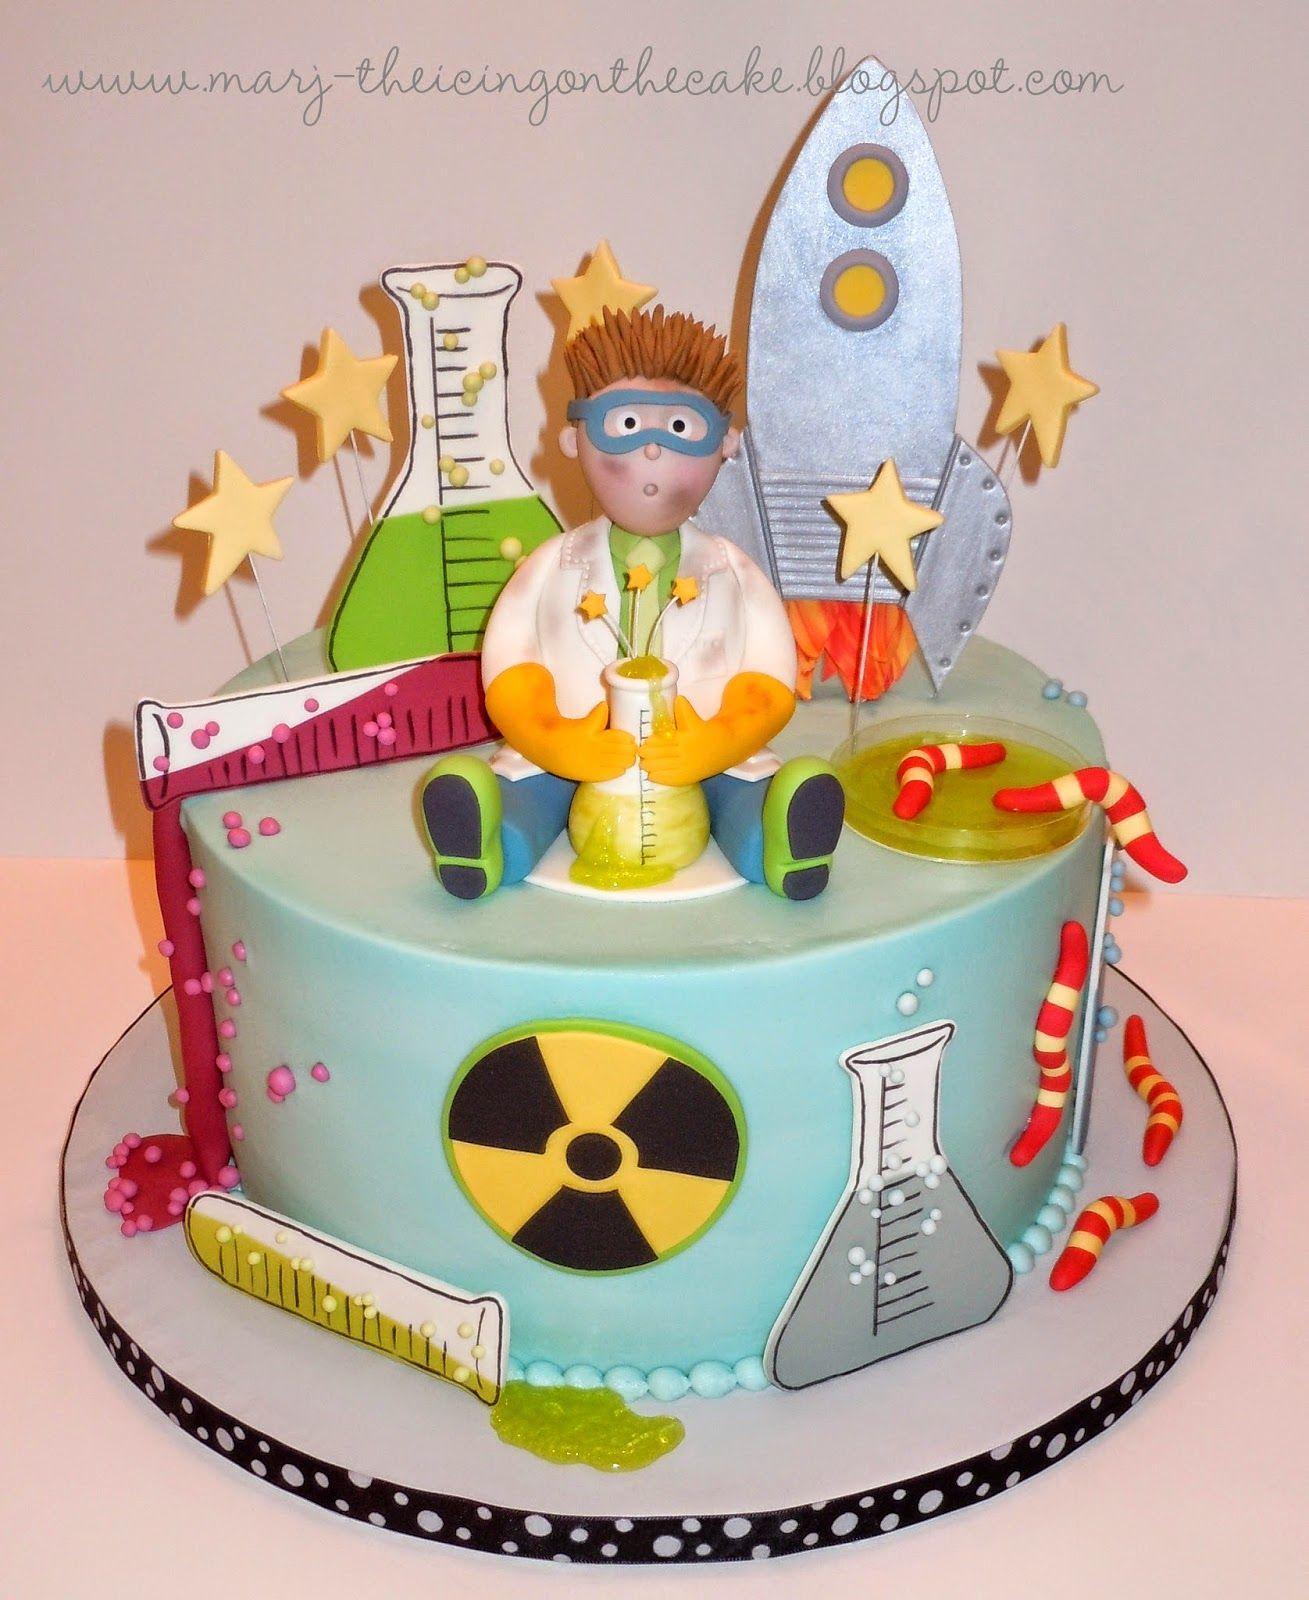 Peachy Eureka Science Cake Birthday Cake Kids Scientist Birthday Birthday Cards Printable Inklcafe Filternl